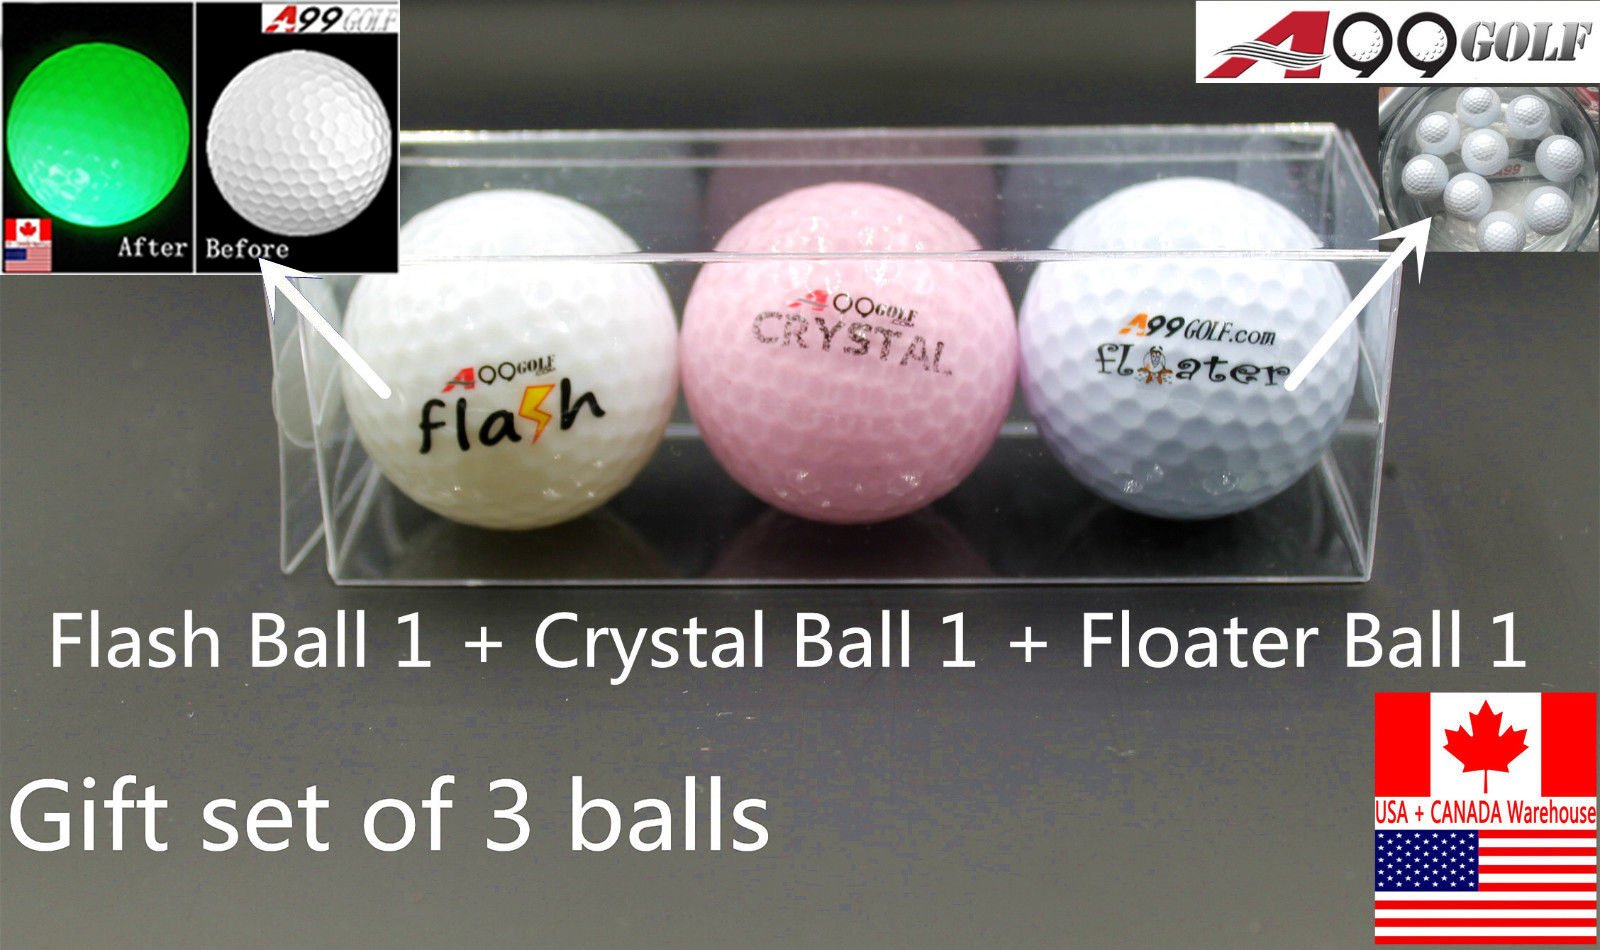 A99 Golf Gift Set of Balls 1 Crystal Ball+1 Flshing Ball Blue+ 1 Floater Ball